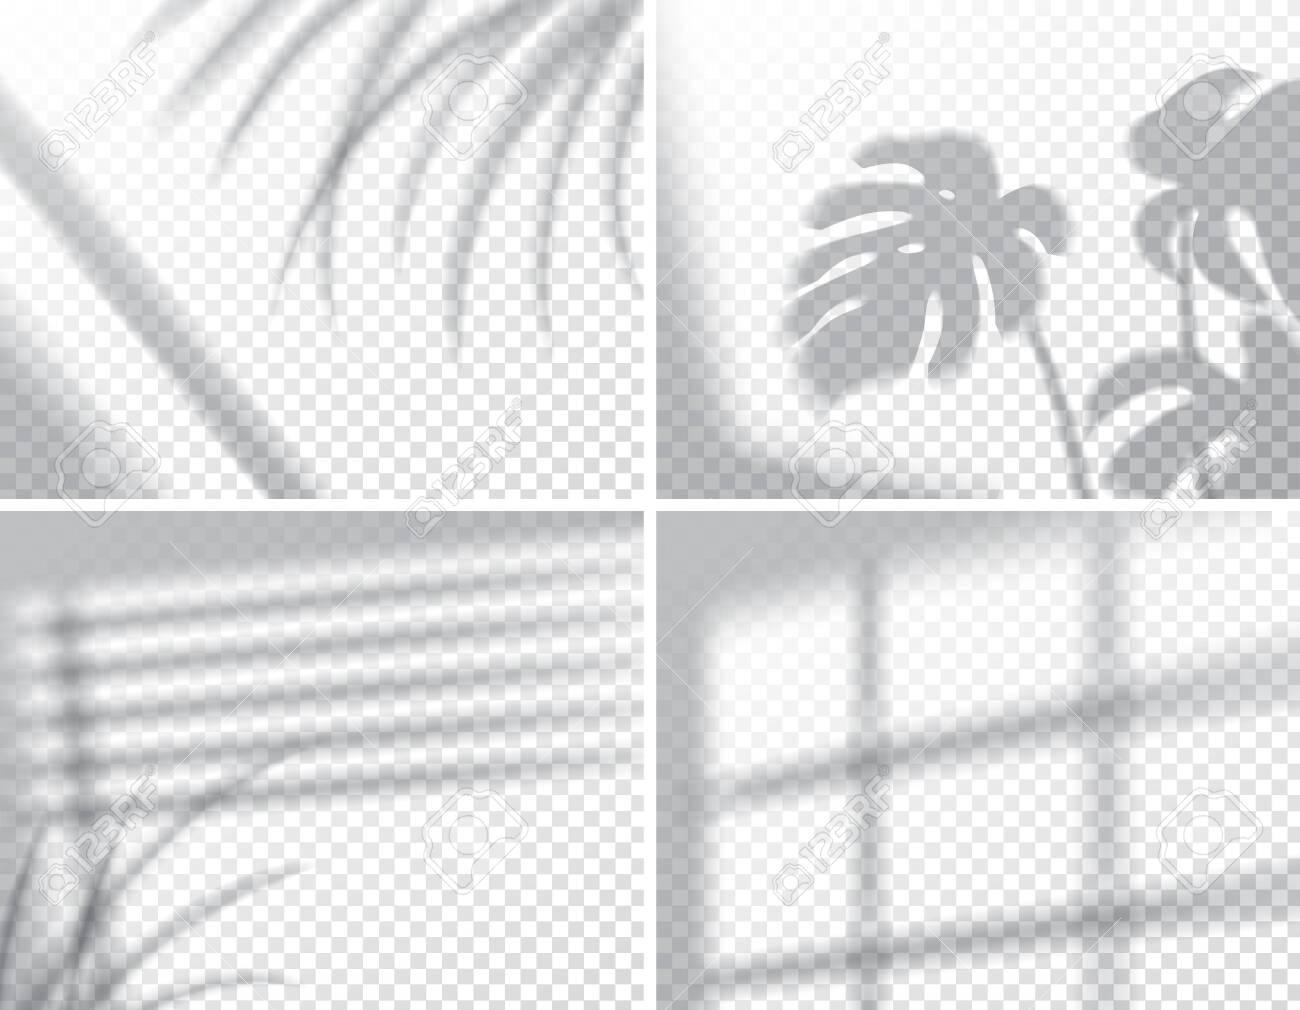 Set of shadows, overlay effects mock up, window frame and leaf of plants, natural interior light, vector illustration - 129393996